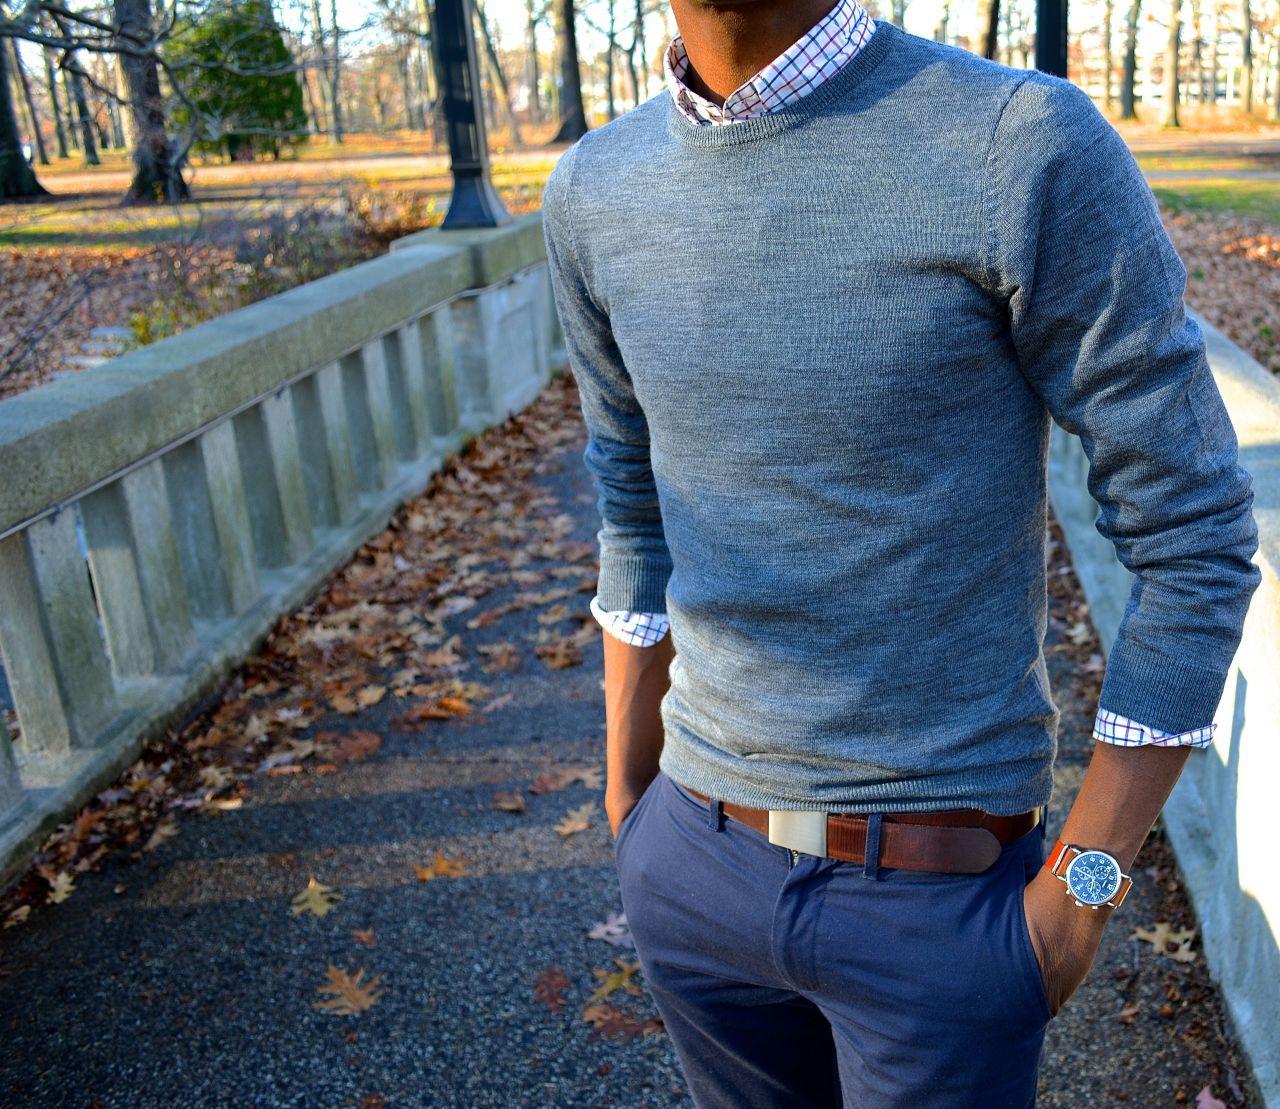 c6859a89a5e1 The Contemporary Gentleman   Tøj   Pinterest   Man style, Men s ...